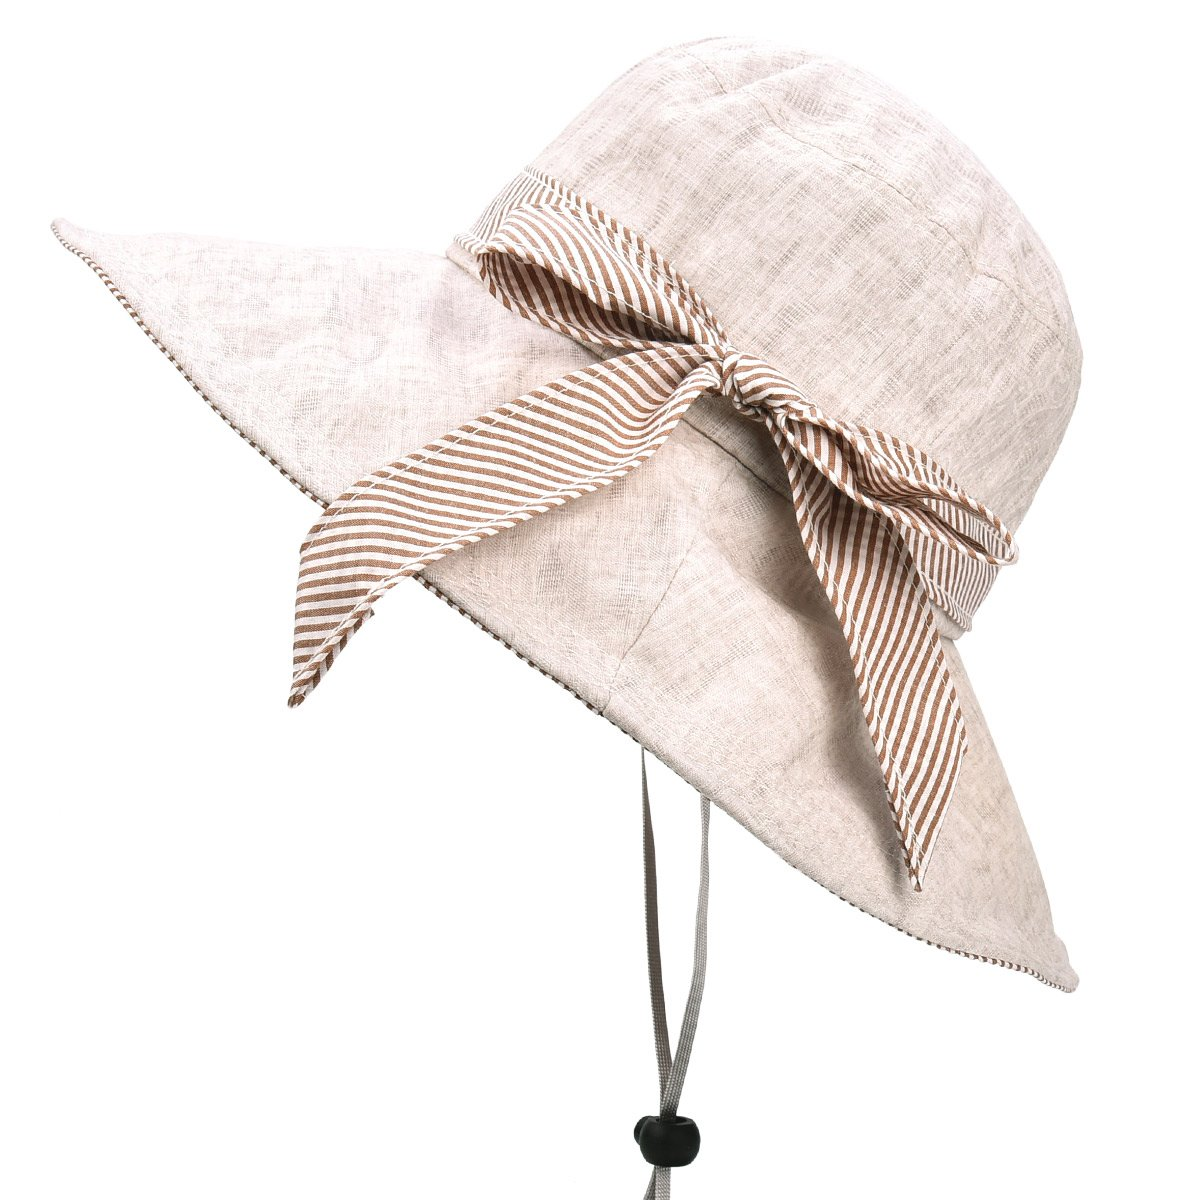 SOMALER Sun Hats for Women Roll-up Wide Brim Summer Beach Hat Foldable Floppy Cotton Hat